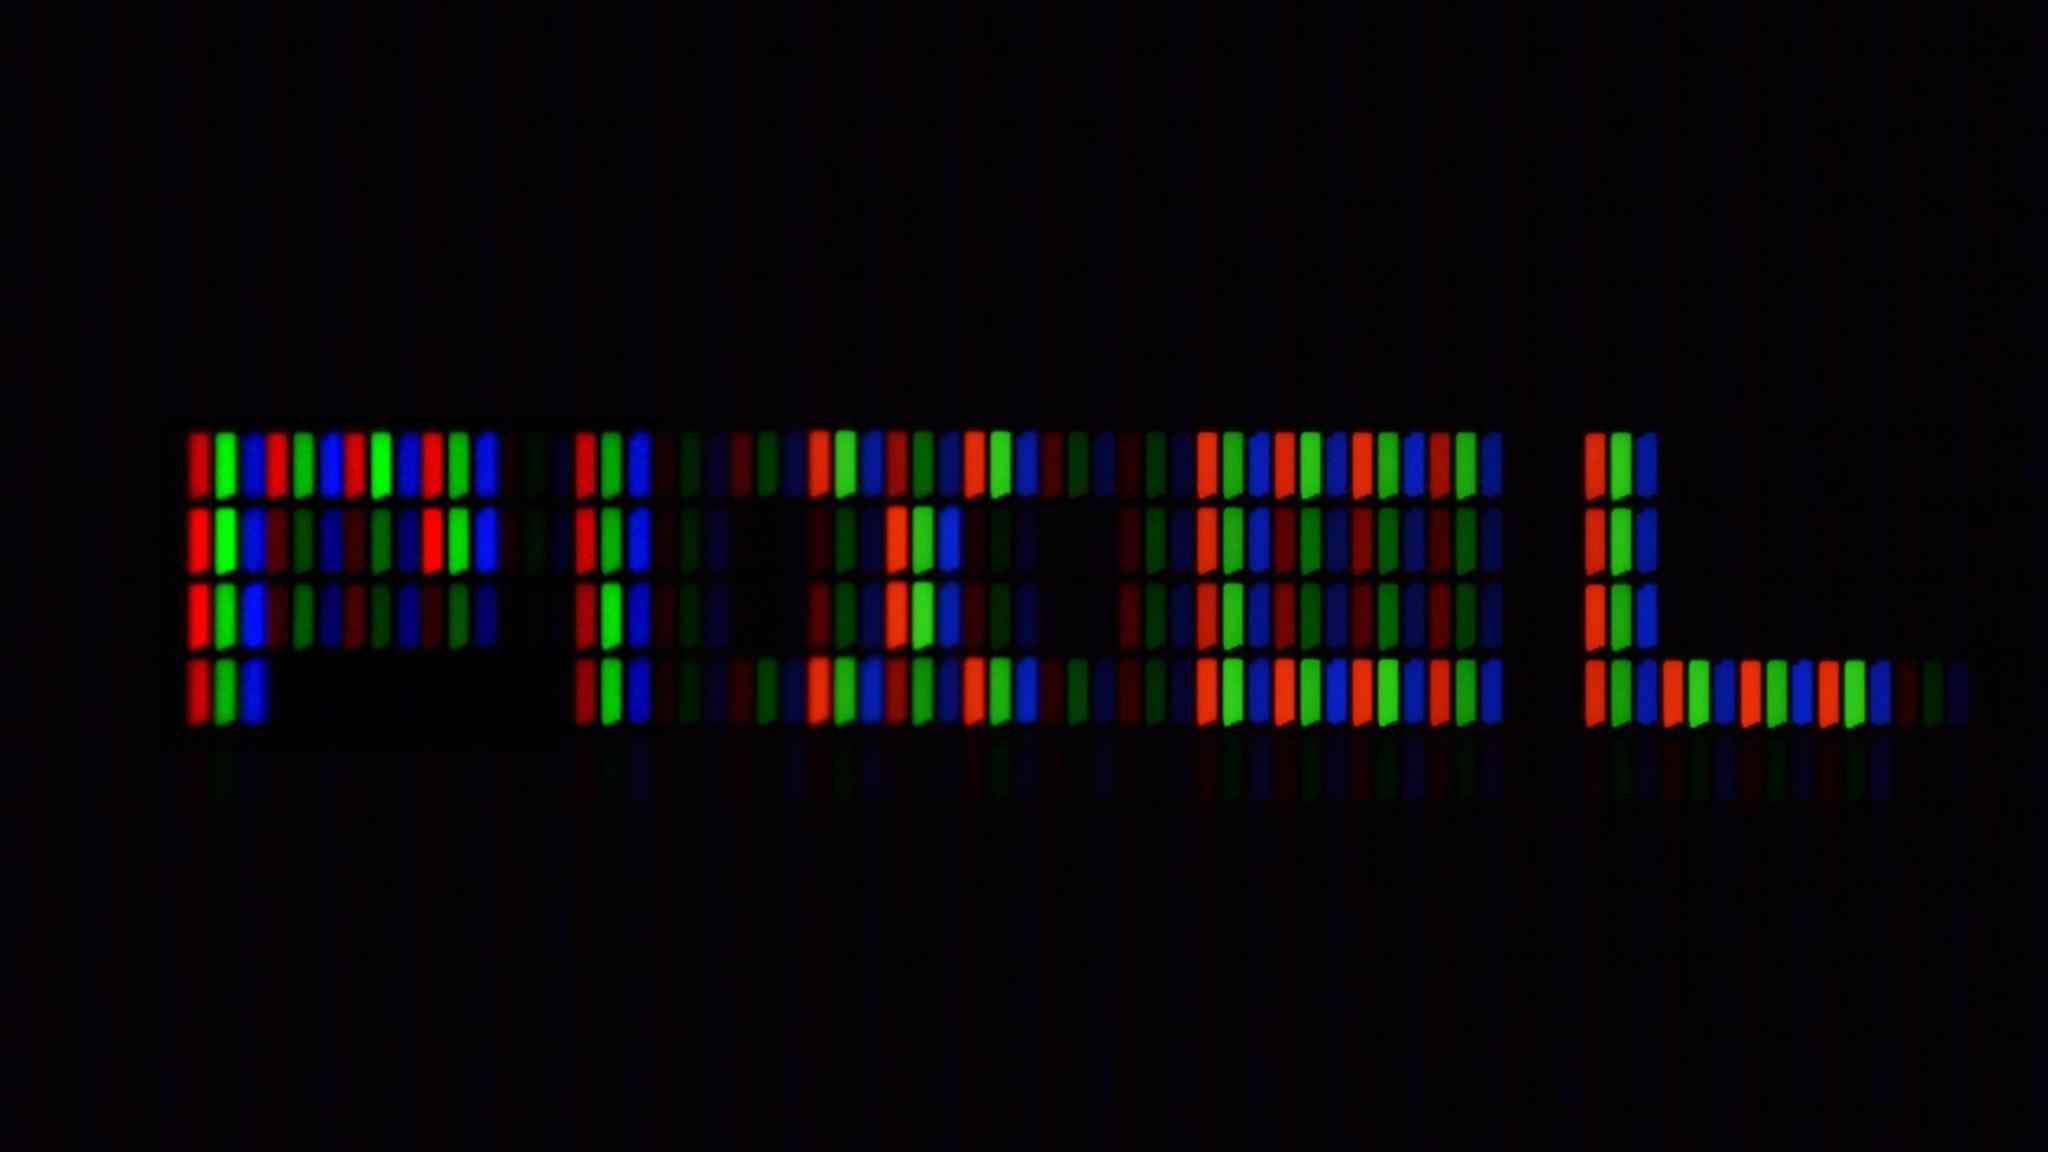 WallpapersWidecom HD 169 High Resolution